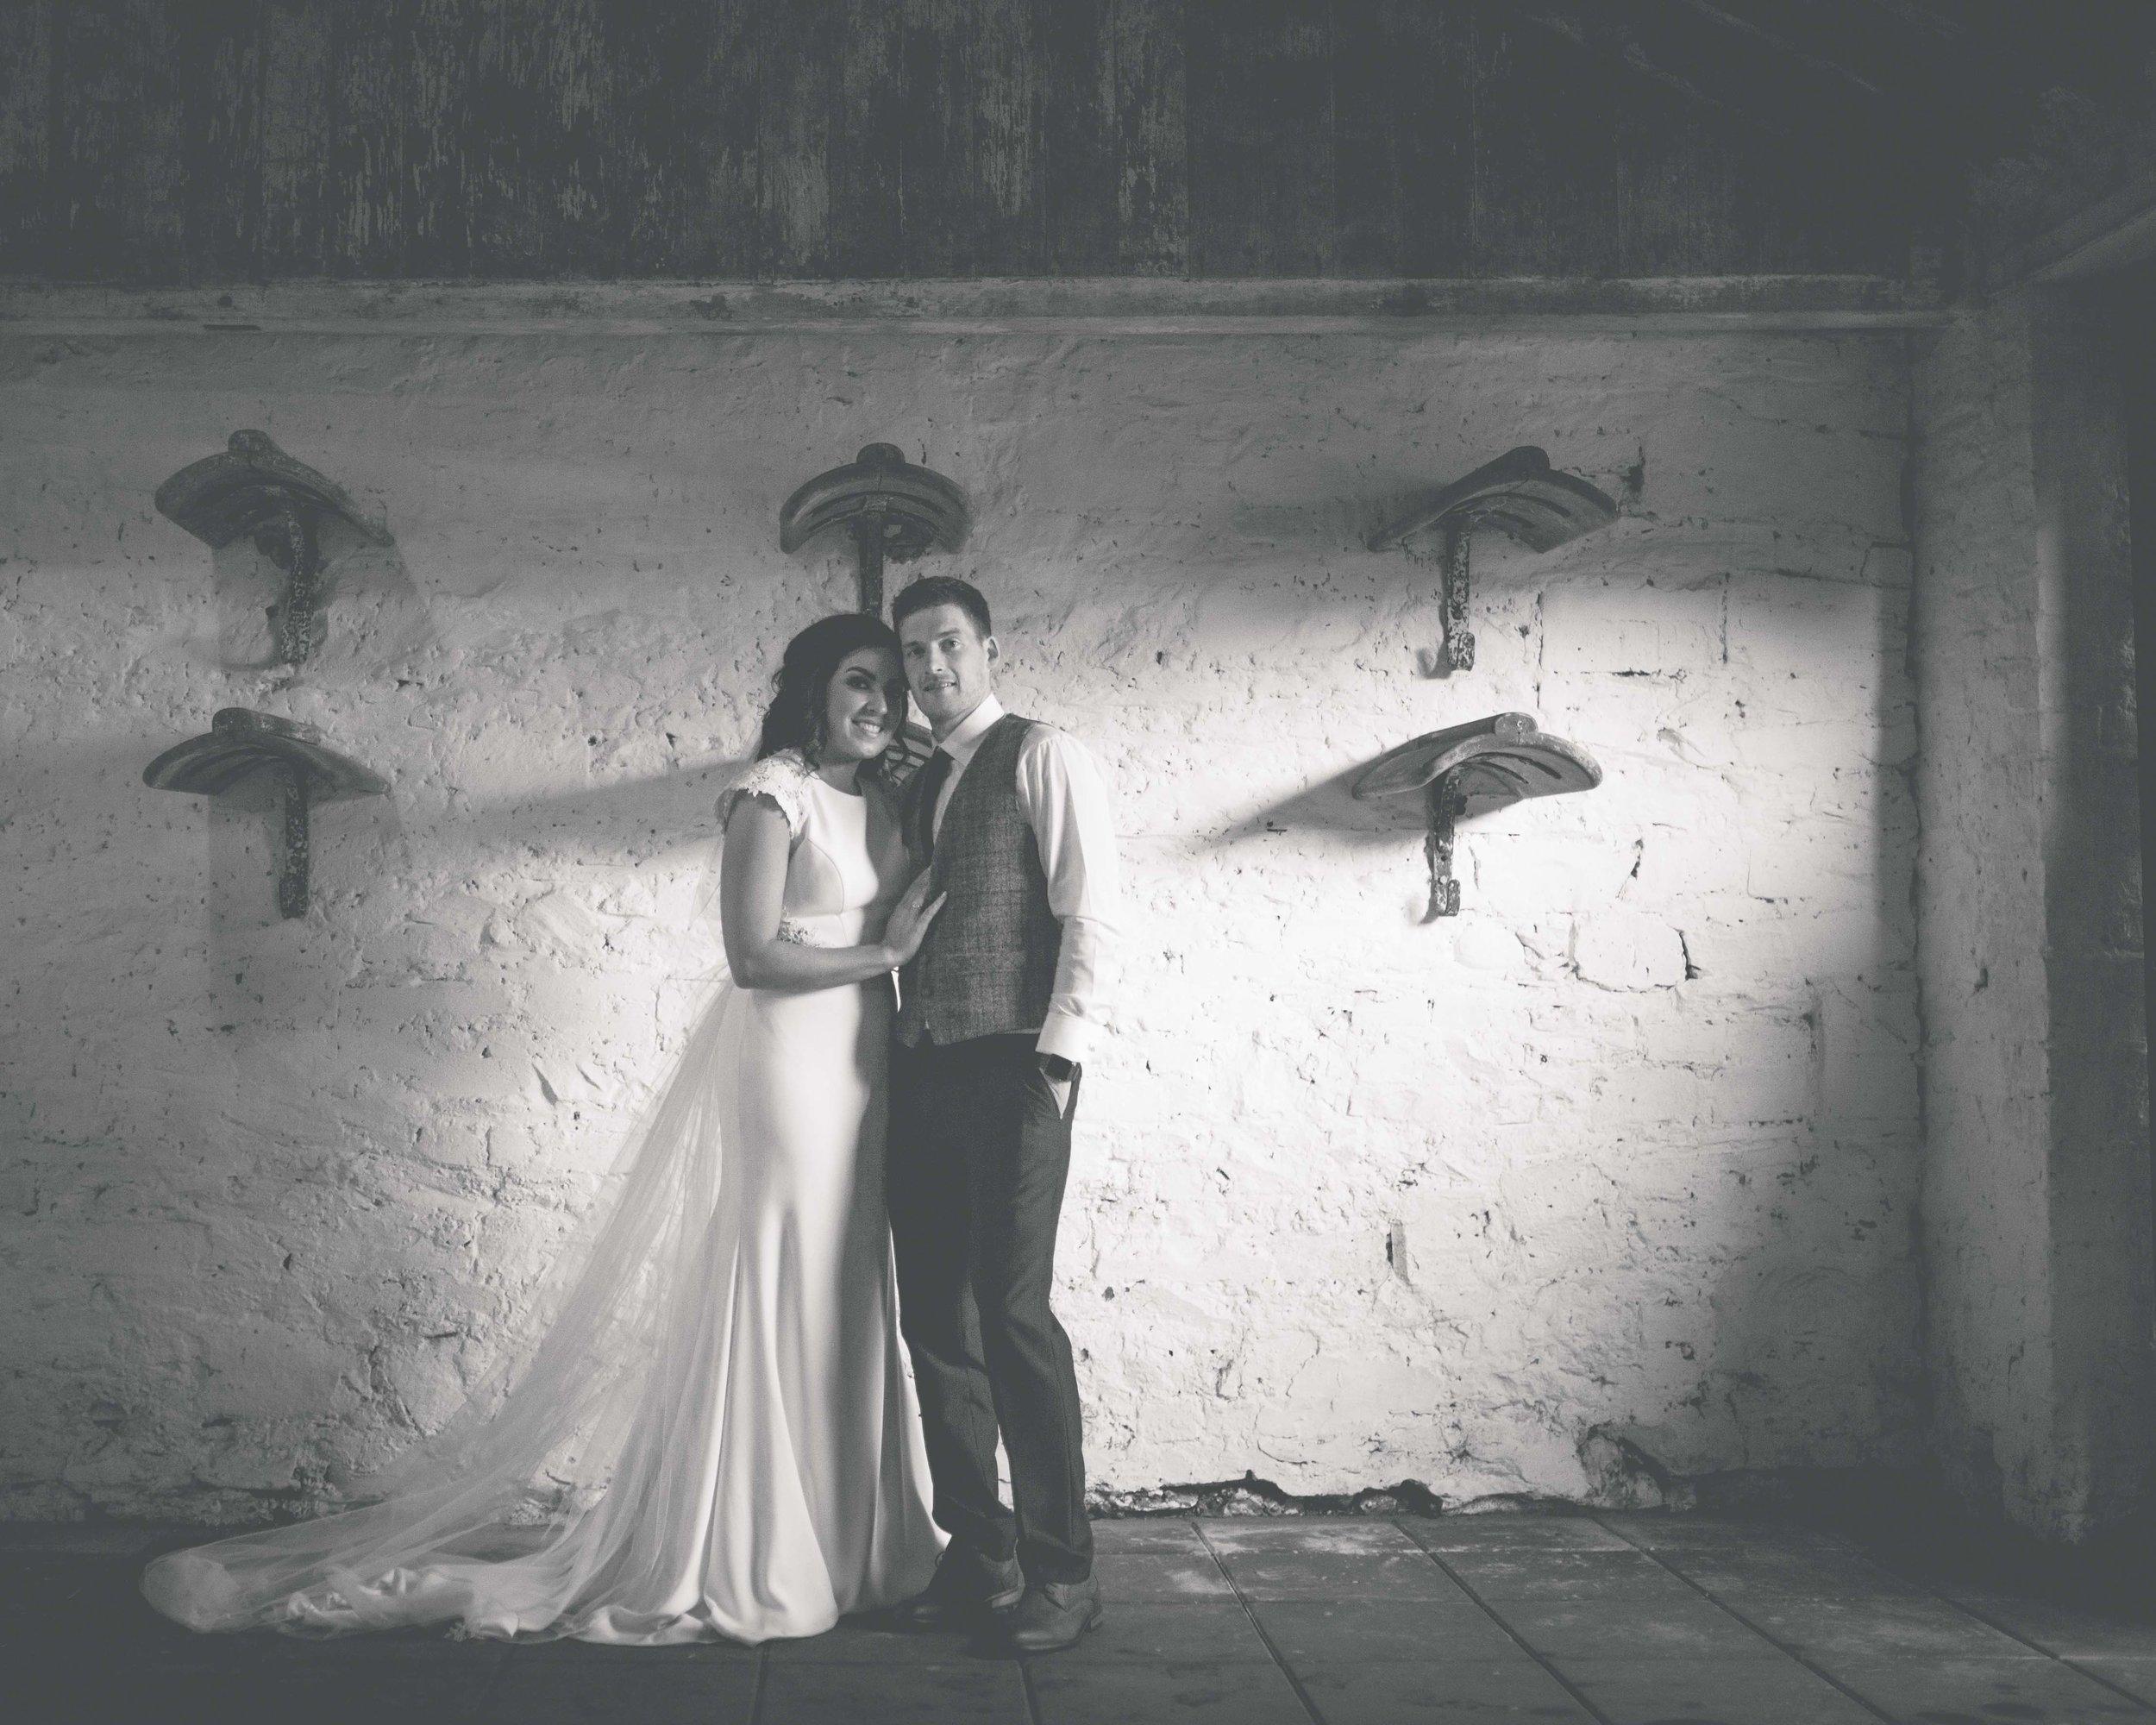 Northern Ireland Wedding Photographer   Brian McEwan Photography   Affordable Wedding Photography Throughout Antrim Down Armagh Tyrone Londonderry Derry Down Fermanagh -17.jpg